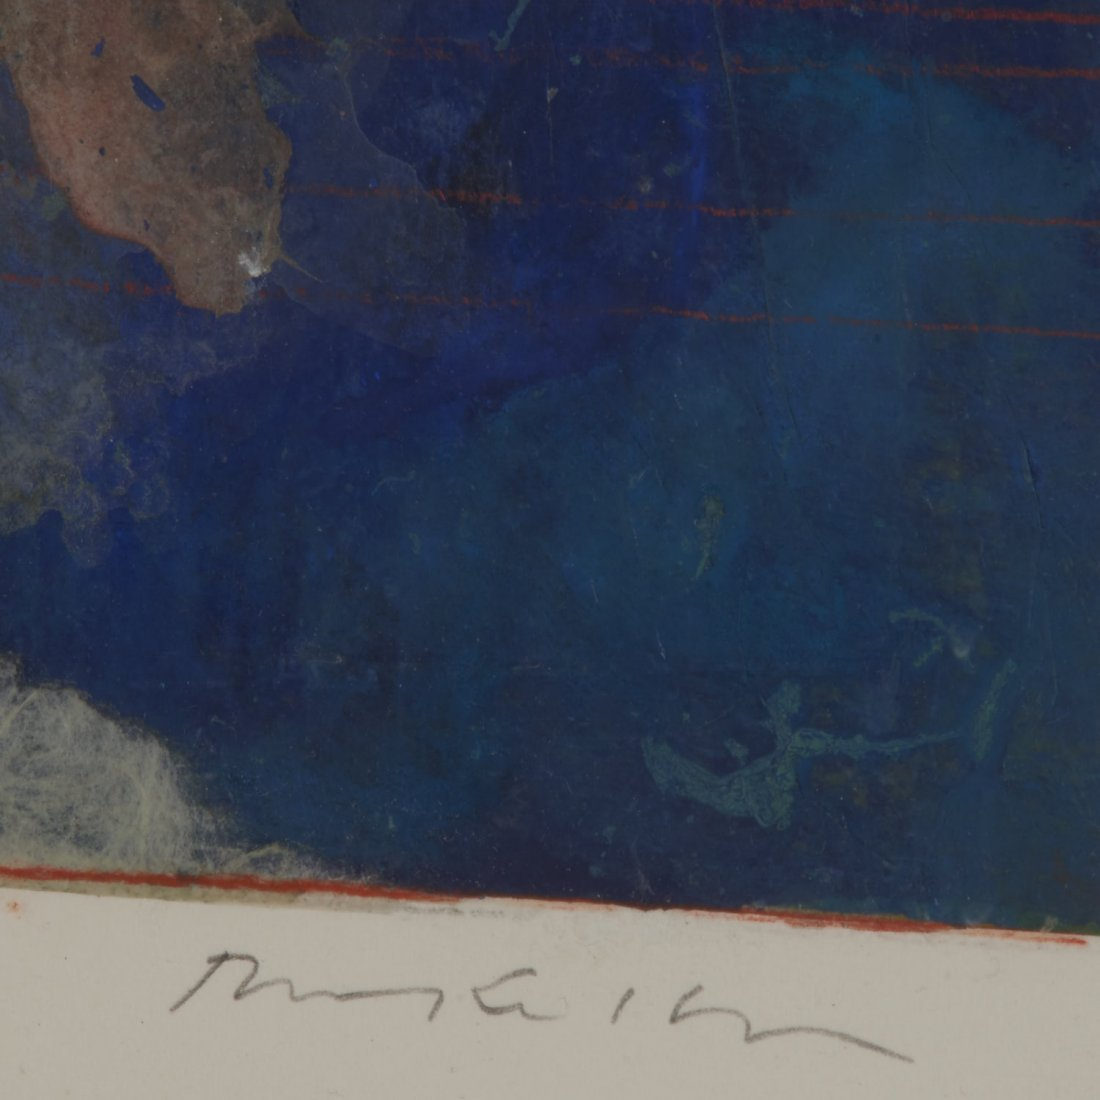 Robert Kelly, large collage monoprint - 5